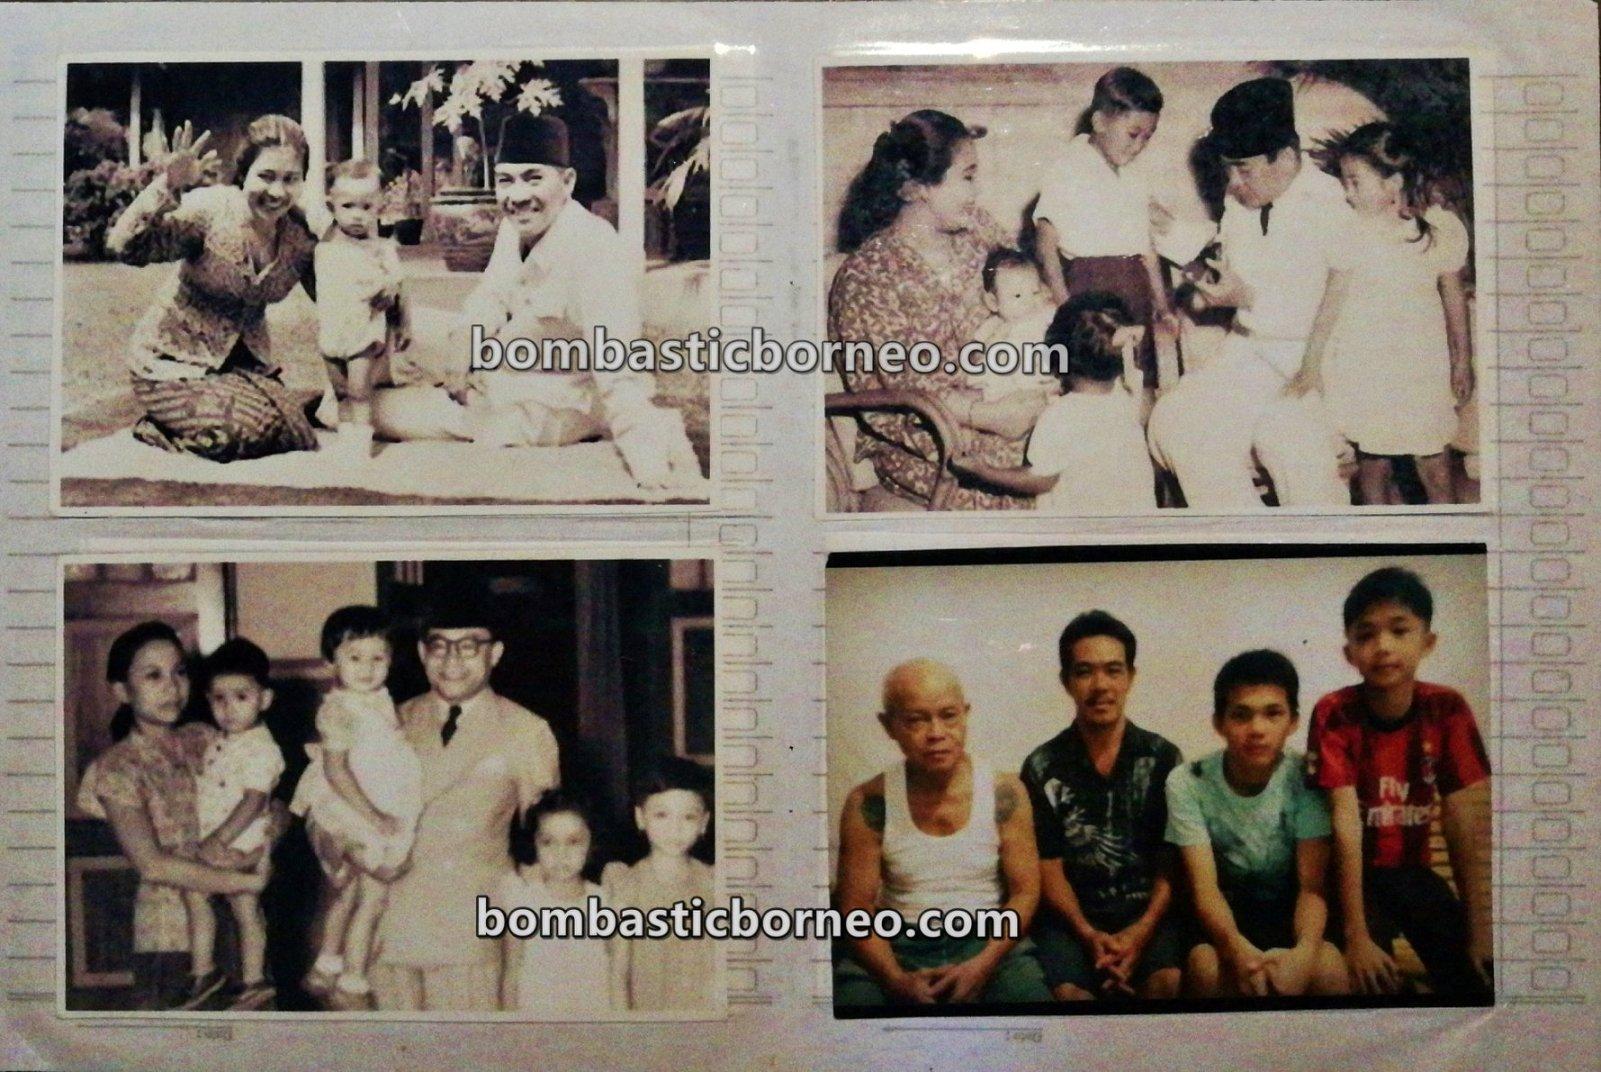 Panglima Siru, Lim Toh Chien, Sungkung, Siang Lim, antiques, antik, history, sejarah, Kalimantan Barat, Bengkayang, Travel, Borneo, 印度尼西亚